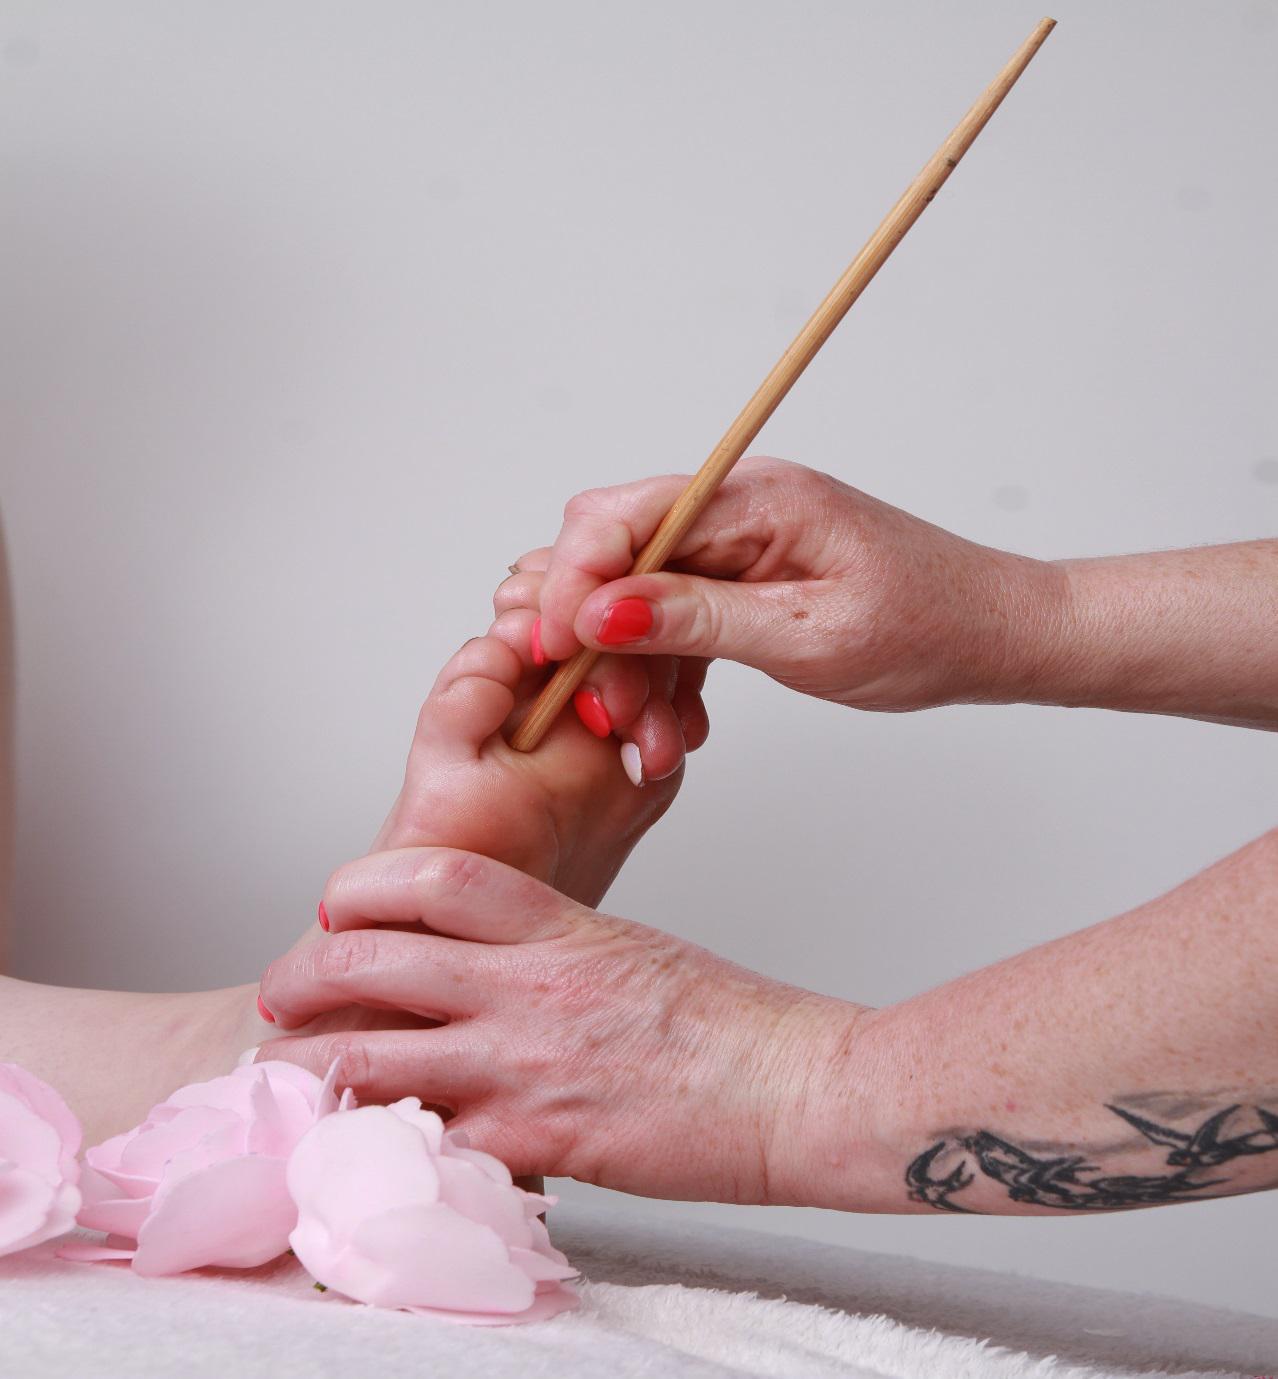 masaż tajski stóp Olsztyn Zamenhofa